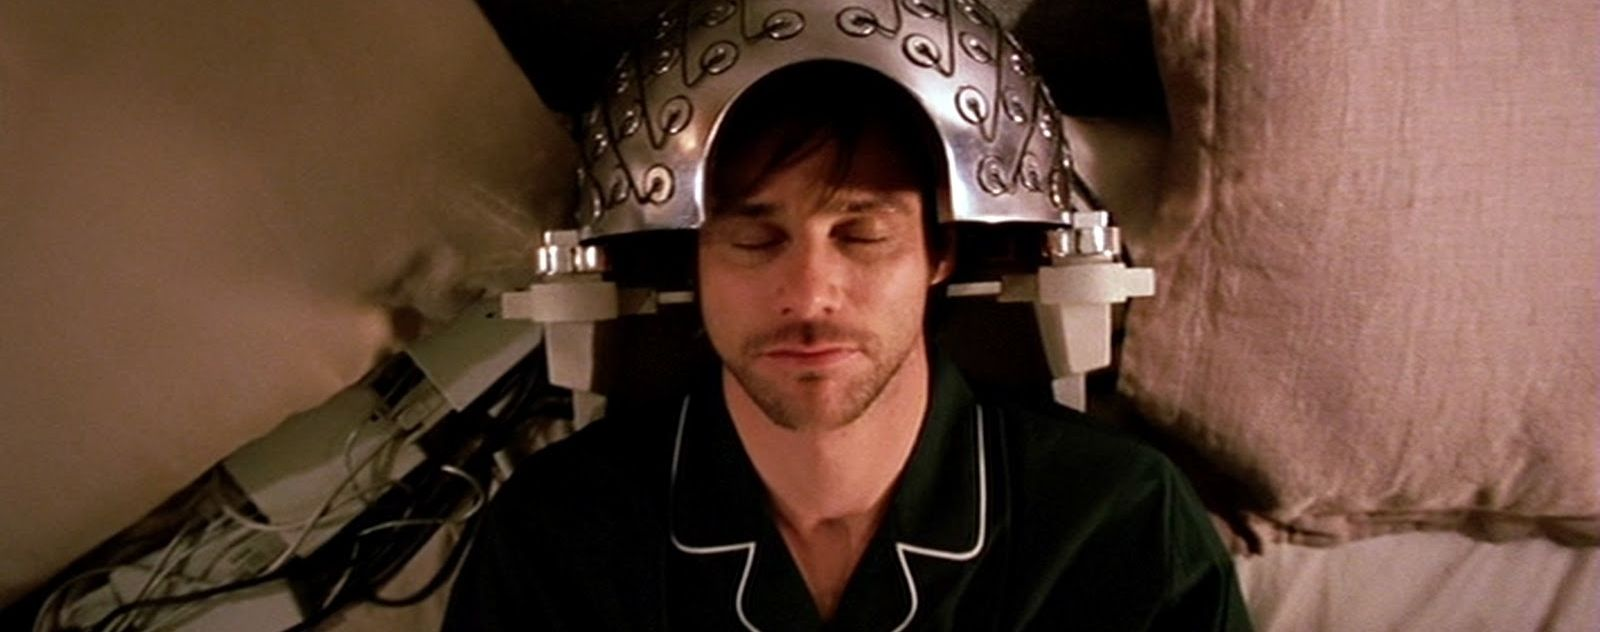 Jim Carrey dans Eternal Sunshine of the Spotless Mind